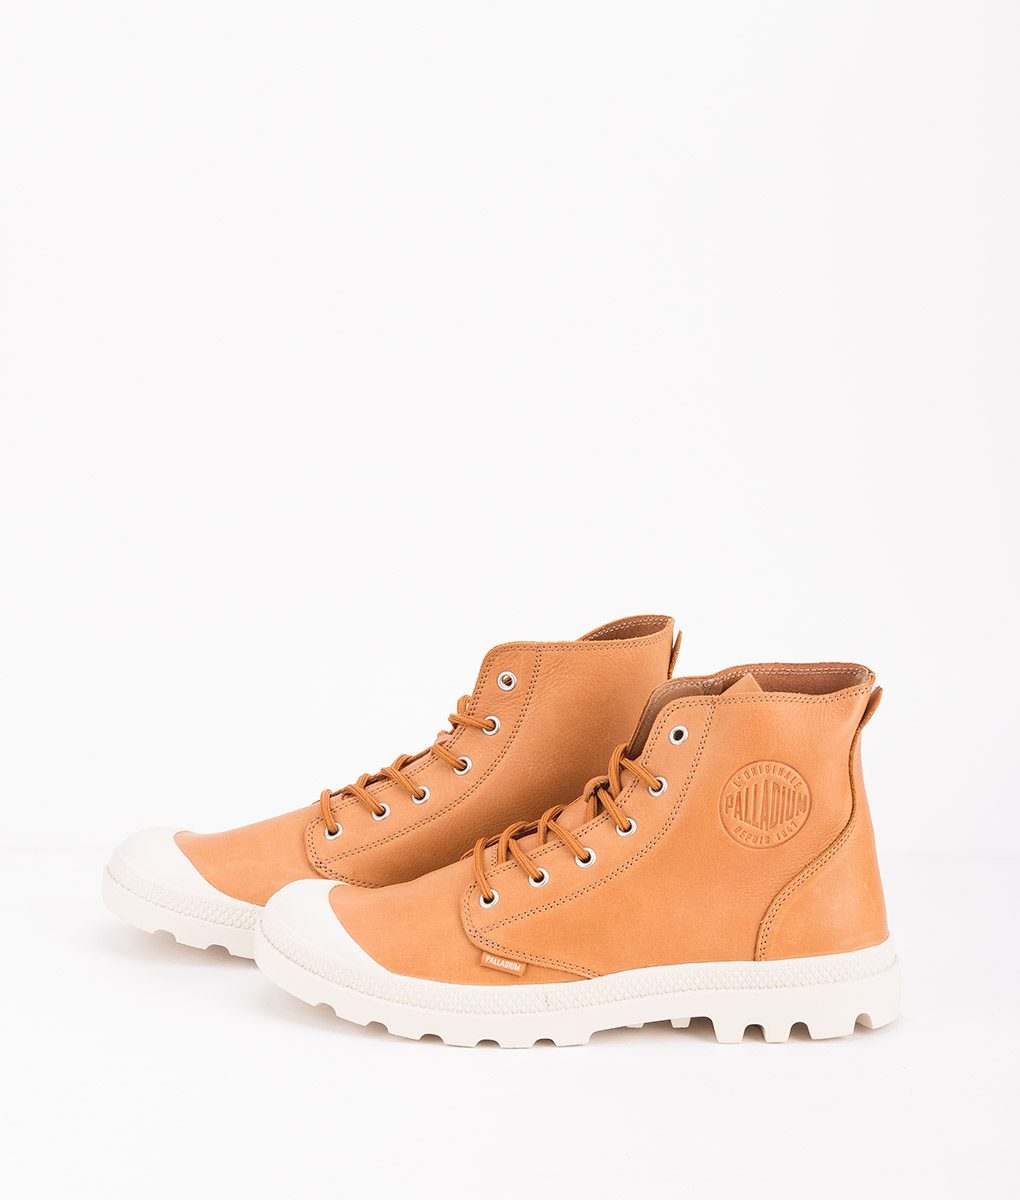 PALLADIUM Men Sneakers 75750 PAMPA HI LEATHER UL, Apricot Birch 119.99